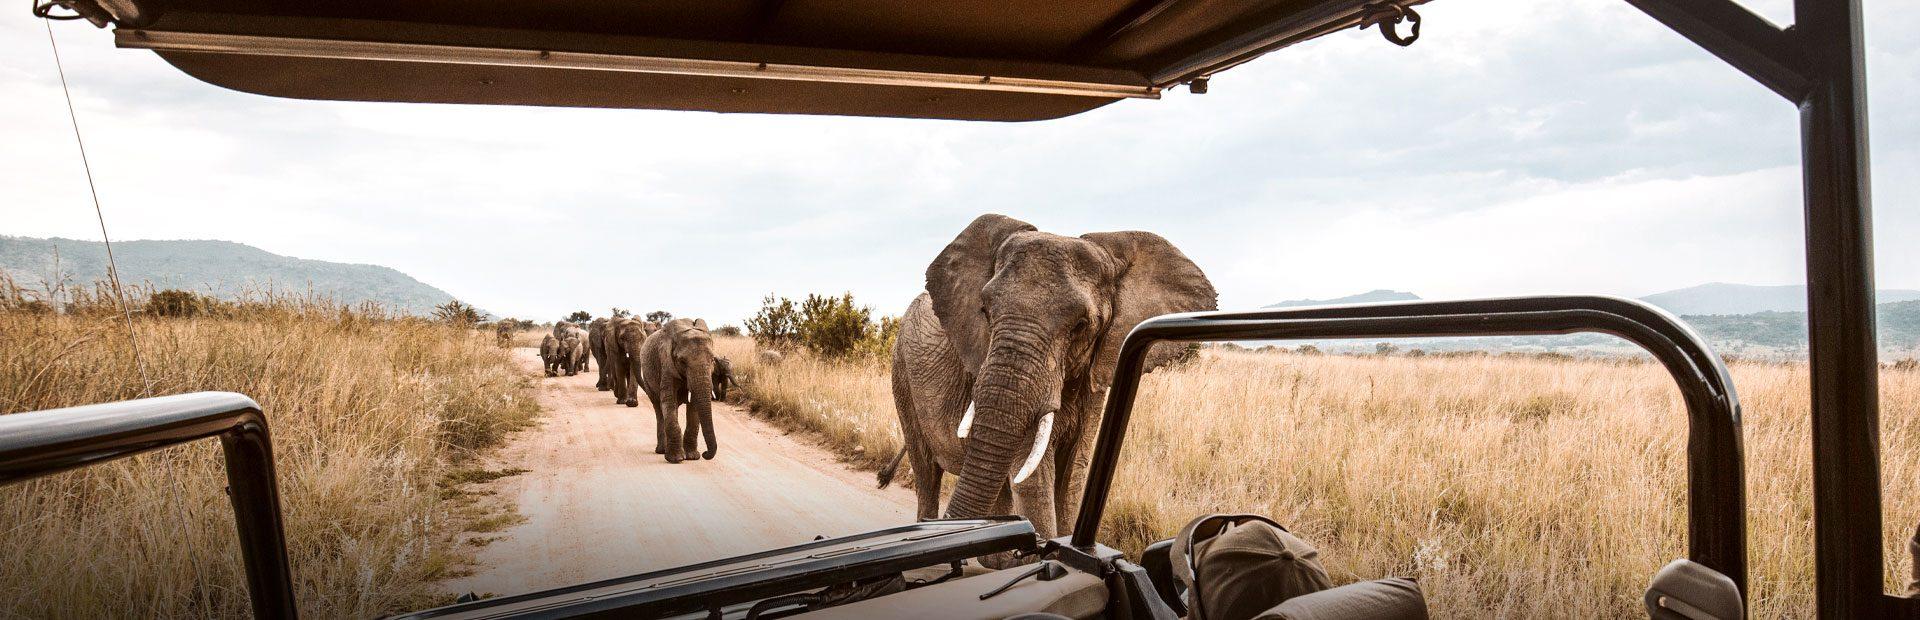 Afrika Reisen mit Safari im Nationalpark